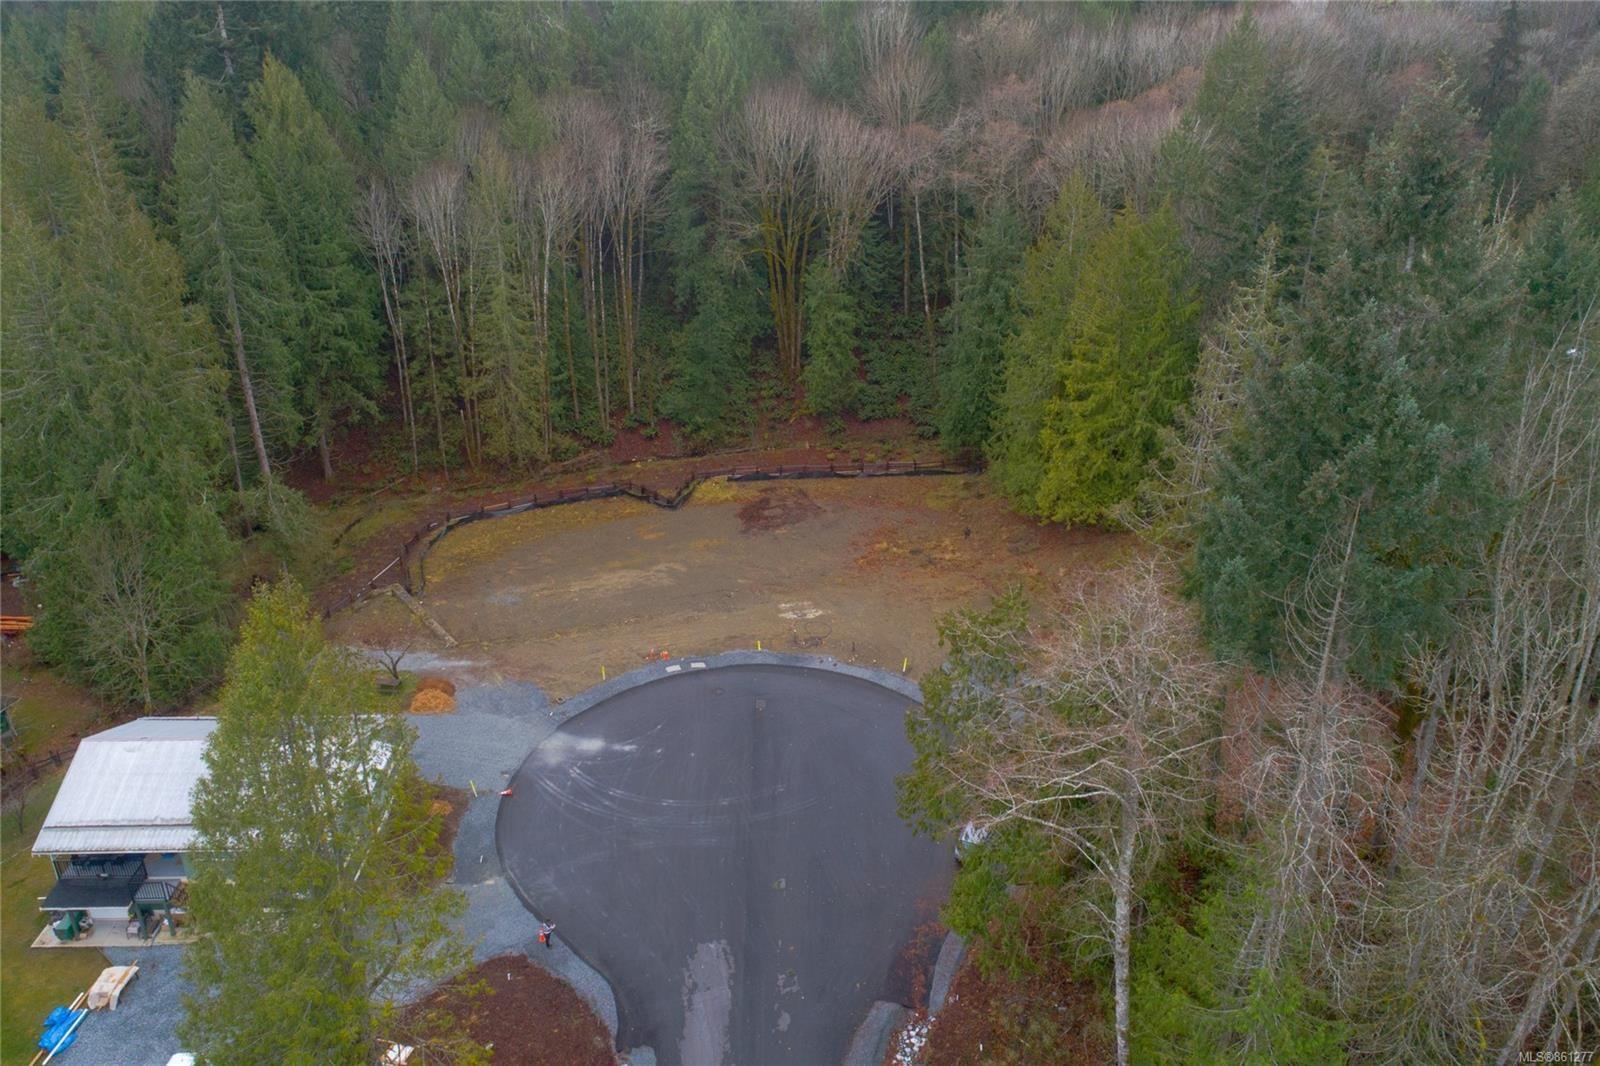 Main Photo: Lot 3 Mel Pl in : ML Shawnigan Land for sale (Malahat & Area)  : MLS®# 861277